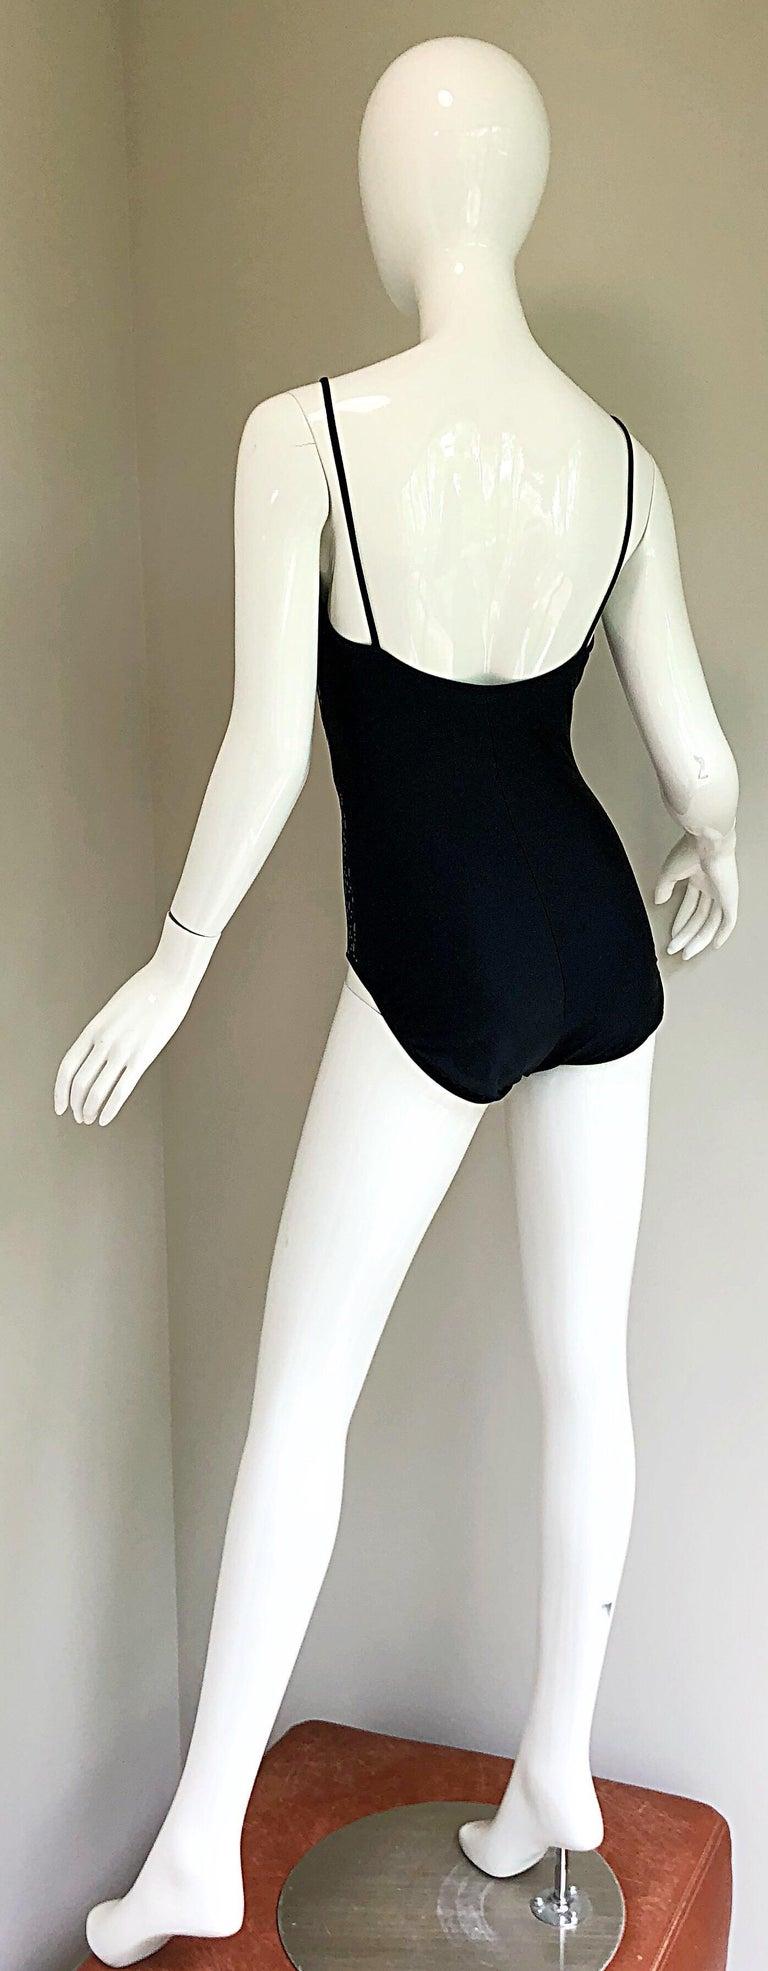 Vintage Oscar de la Renta 90s New w/ Tags Blue Green Sequined One Piece Swimsuit For Sale 3